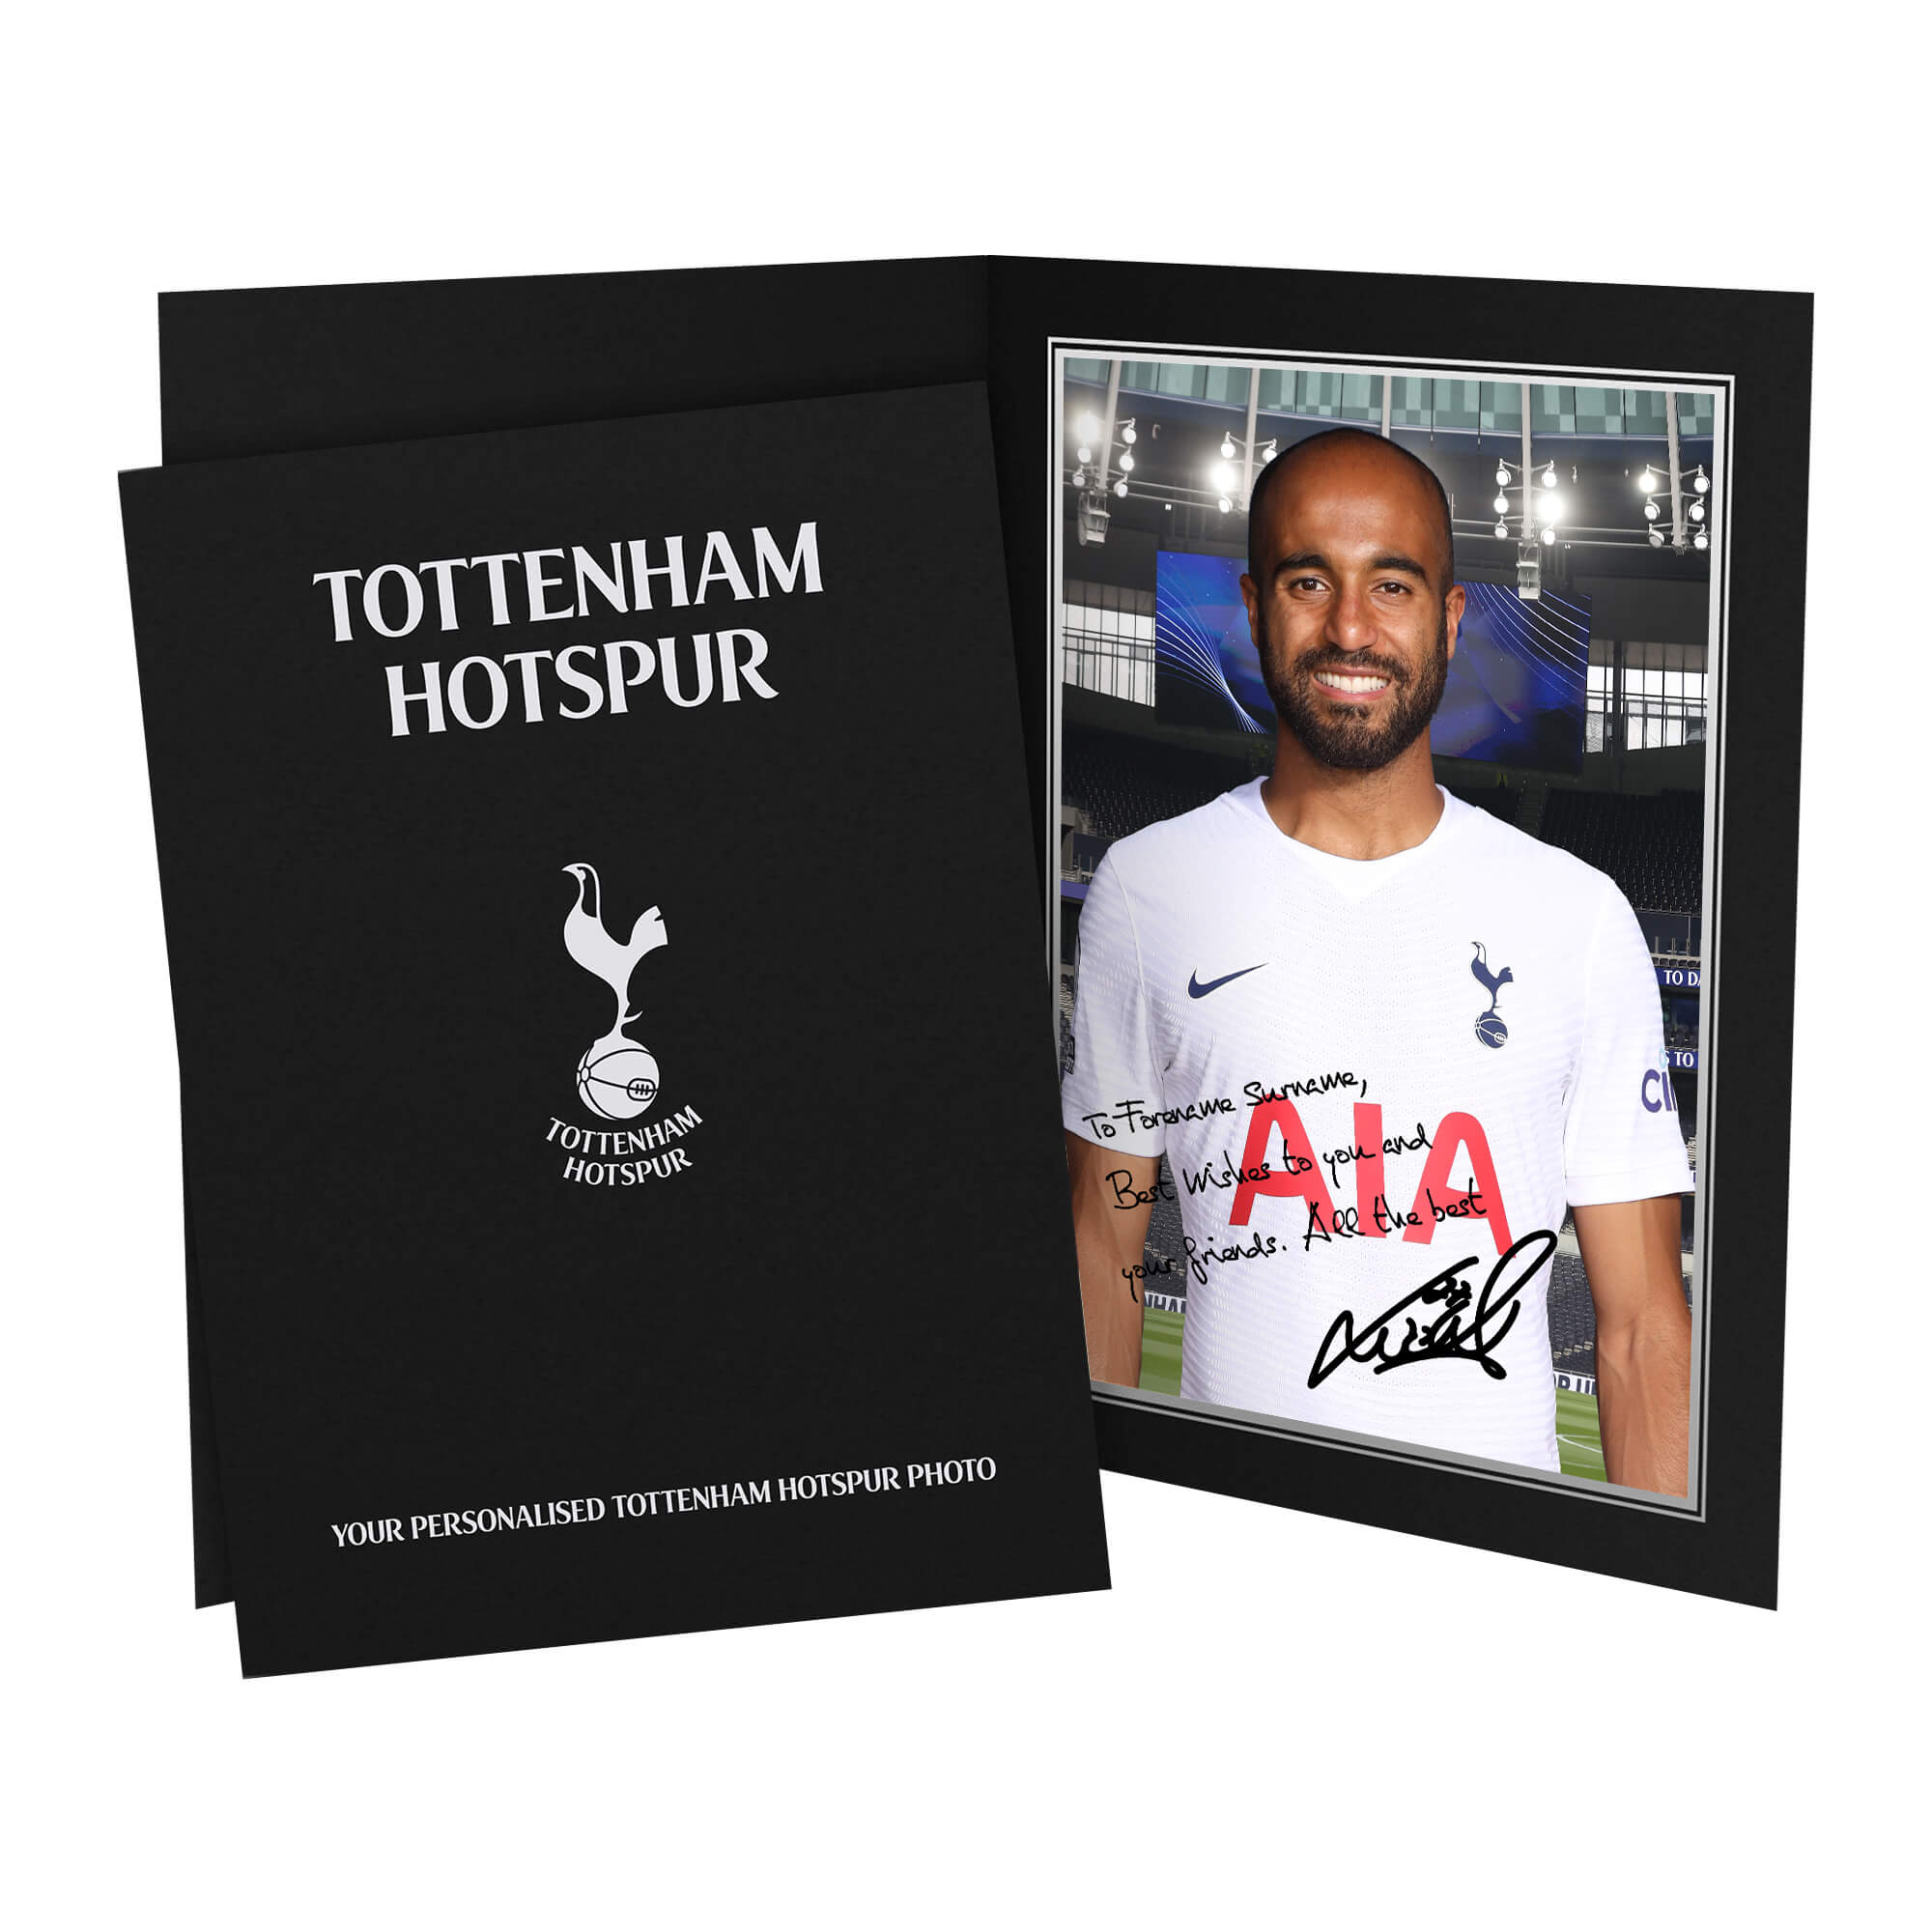 Tottenham Hotspur Moura Autograph Photo Folder